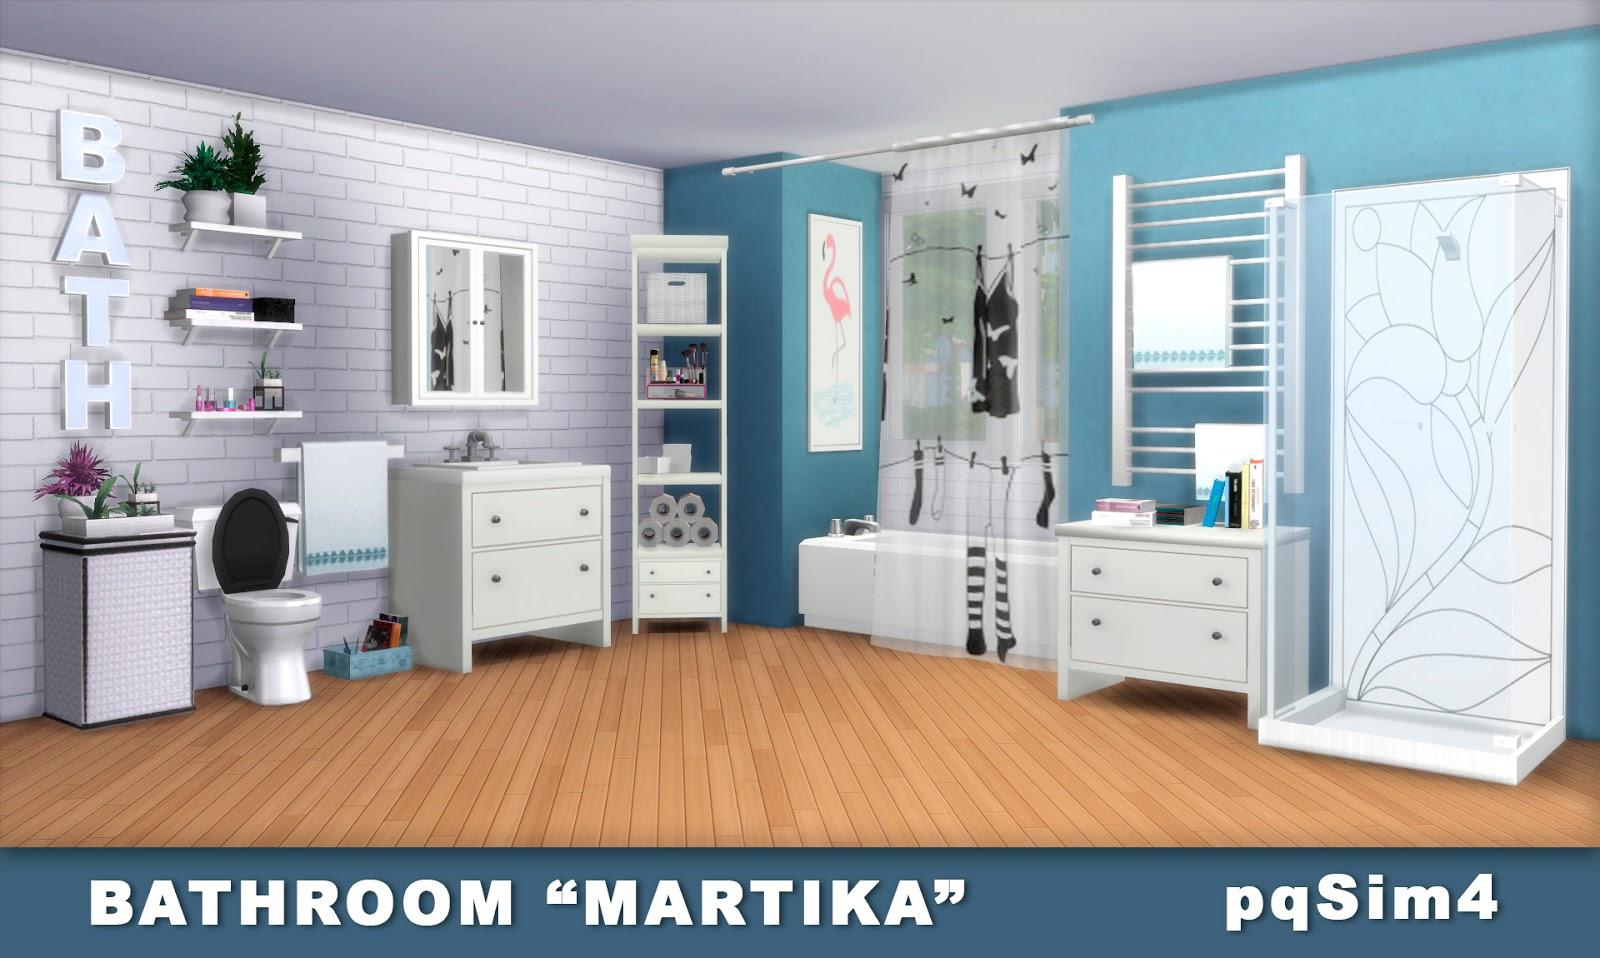 Bathroom martika sims 4 custom content for Bathroom ideas sims 4